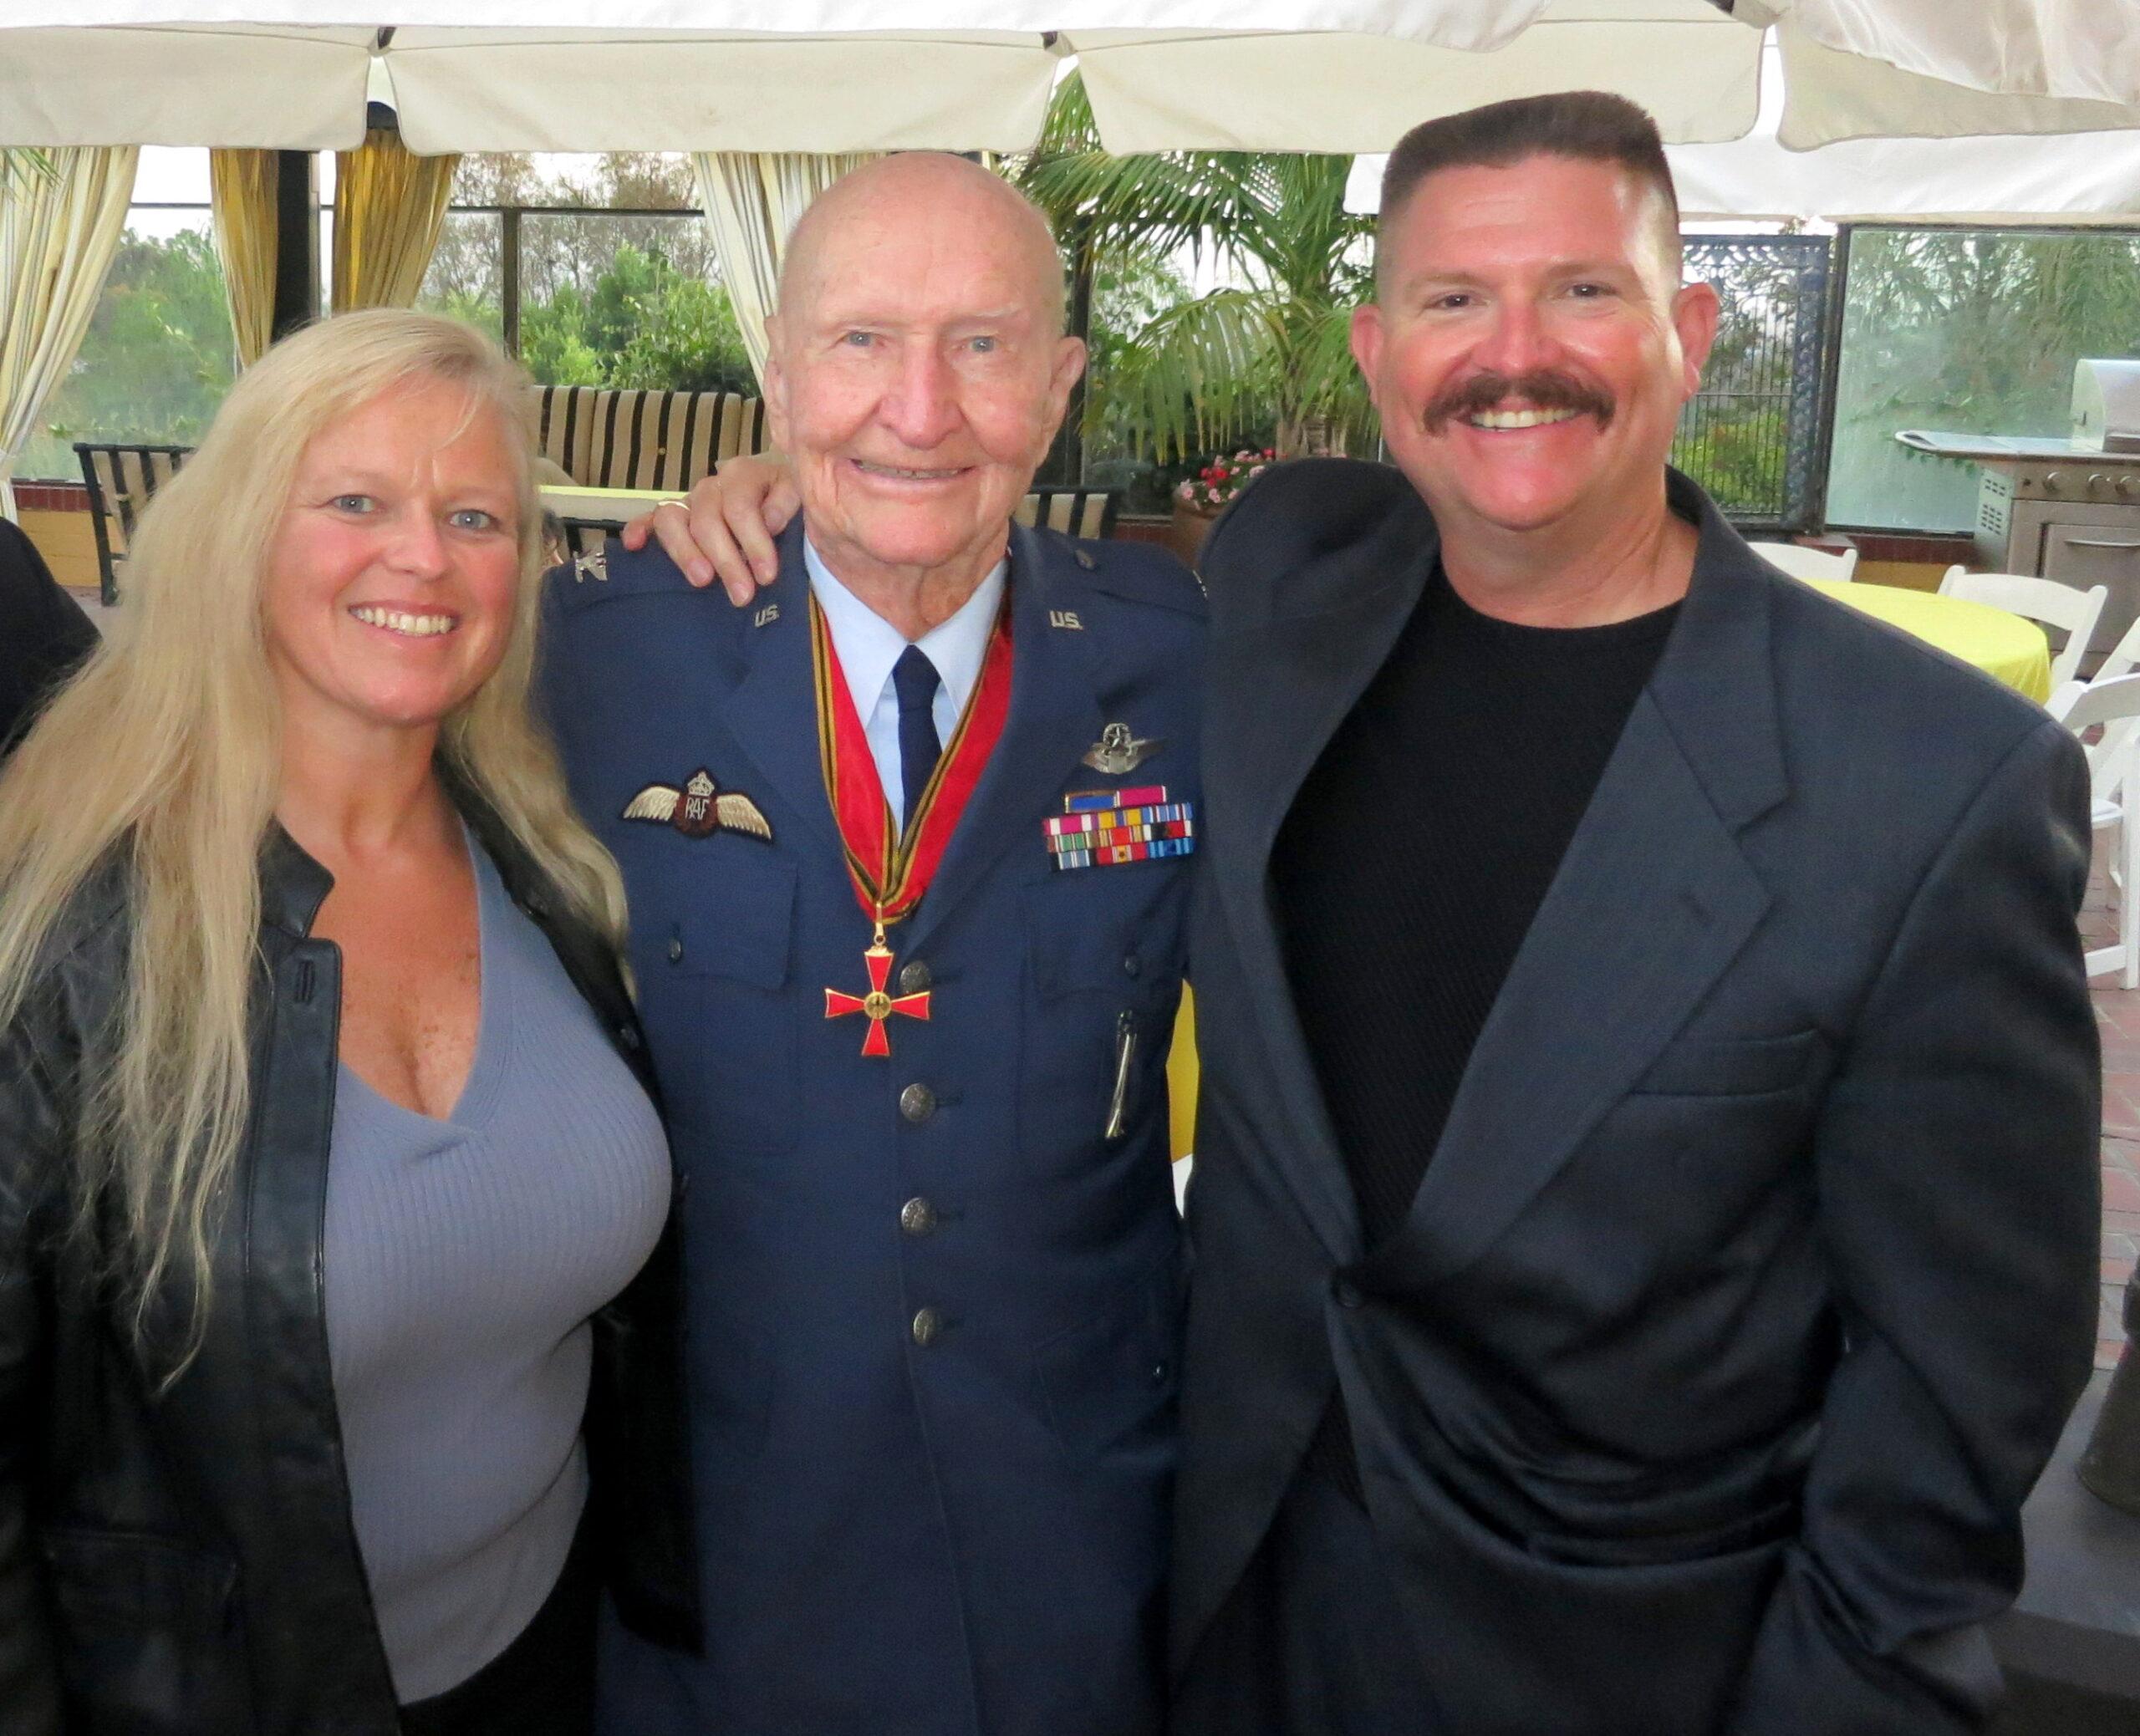 Colonel Gail S. Halvorsen with Mr. & Mrs. Stout